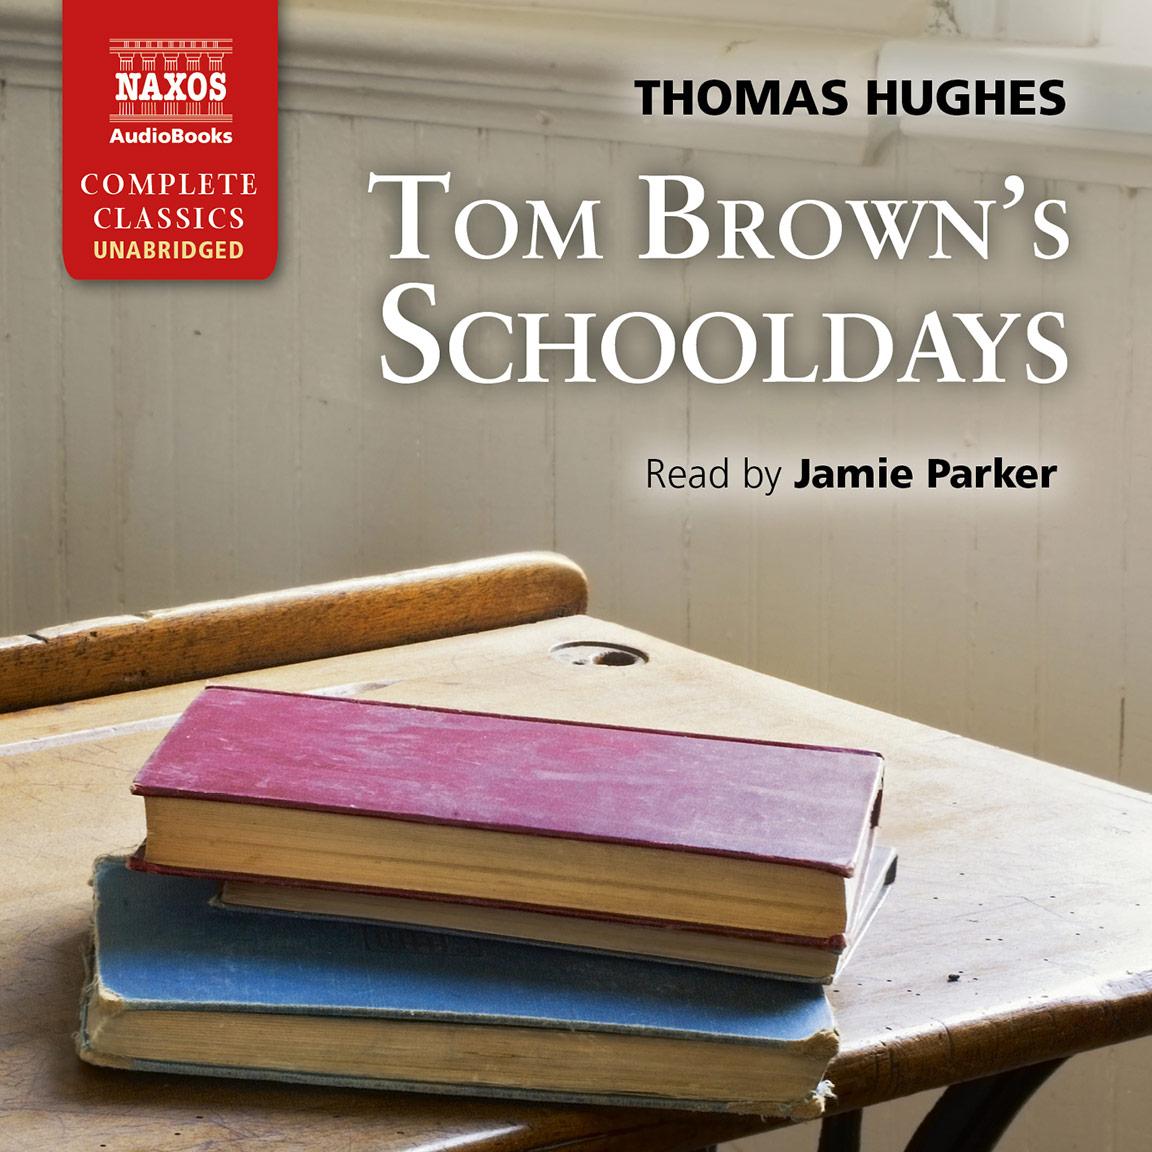 Tom Brown's Schooldays (unabridged)